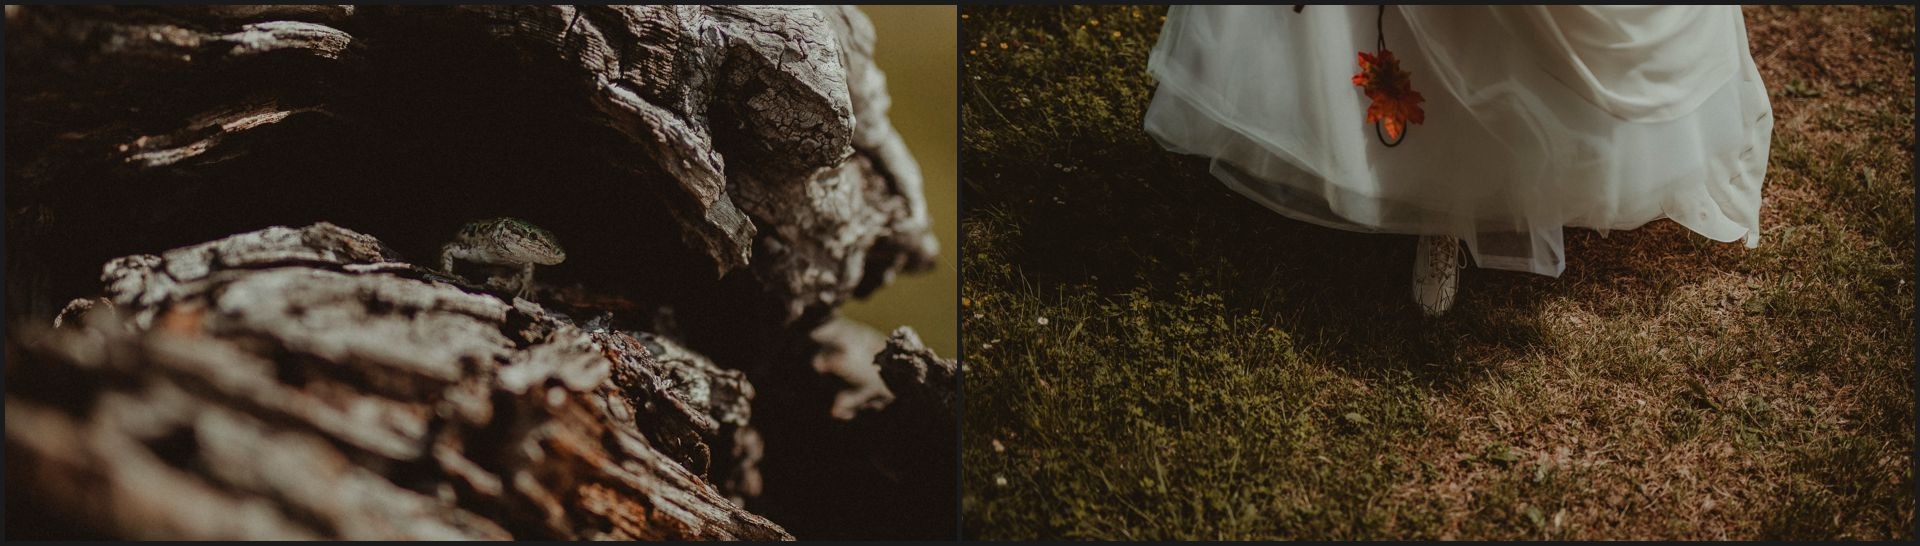 tuscany, alternative wedding, rustic wedding,